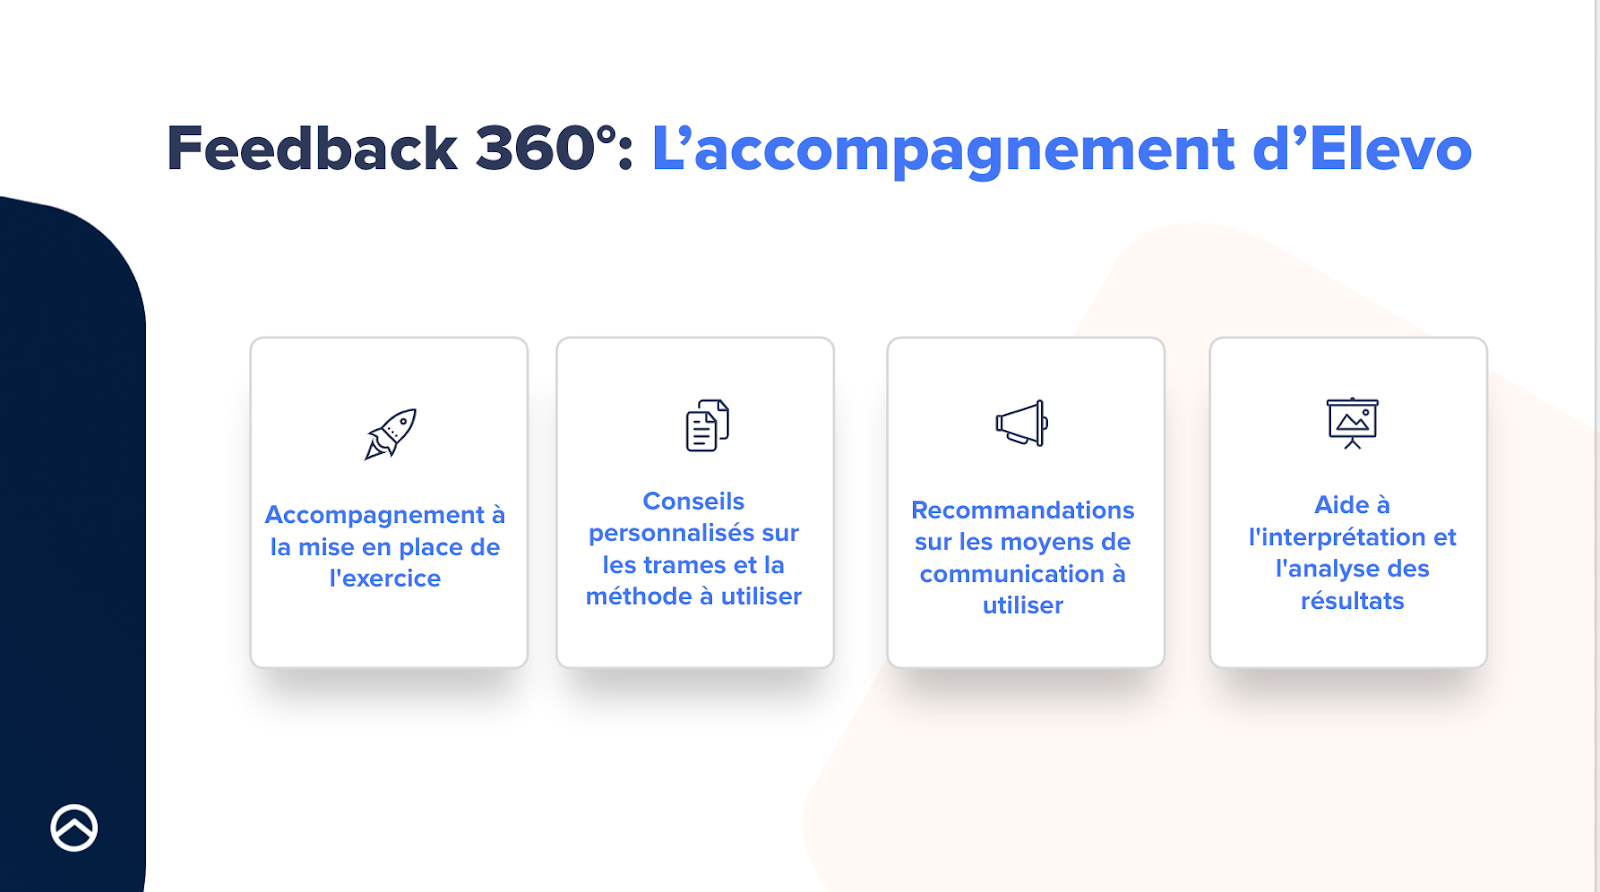 Elevo's support for 360° Feedback